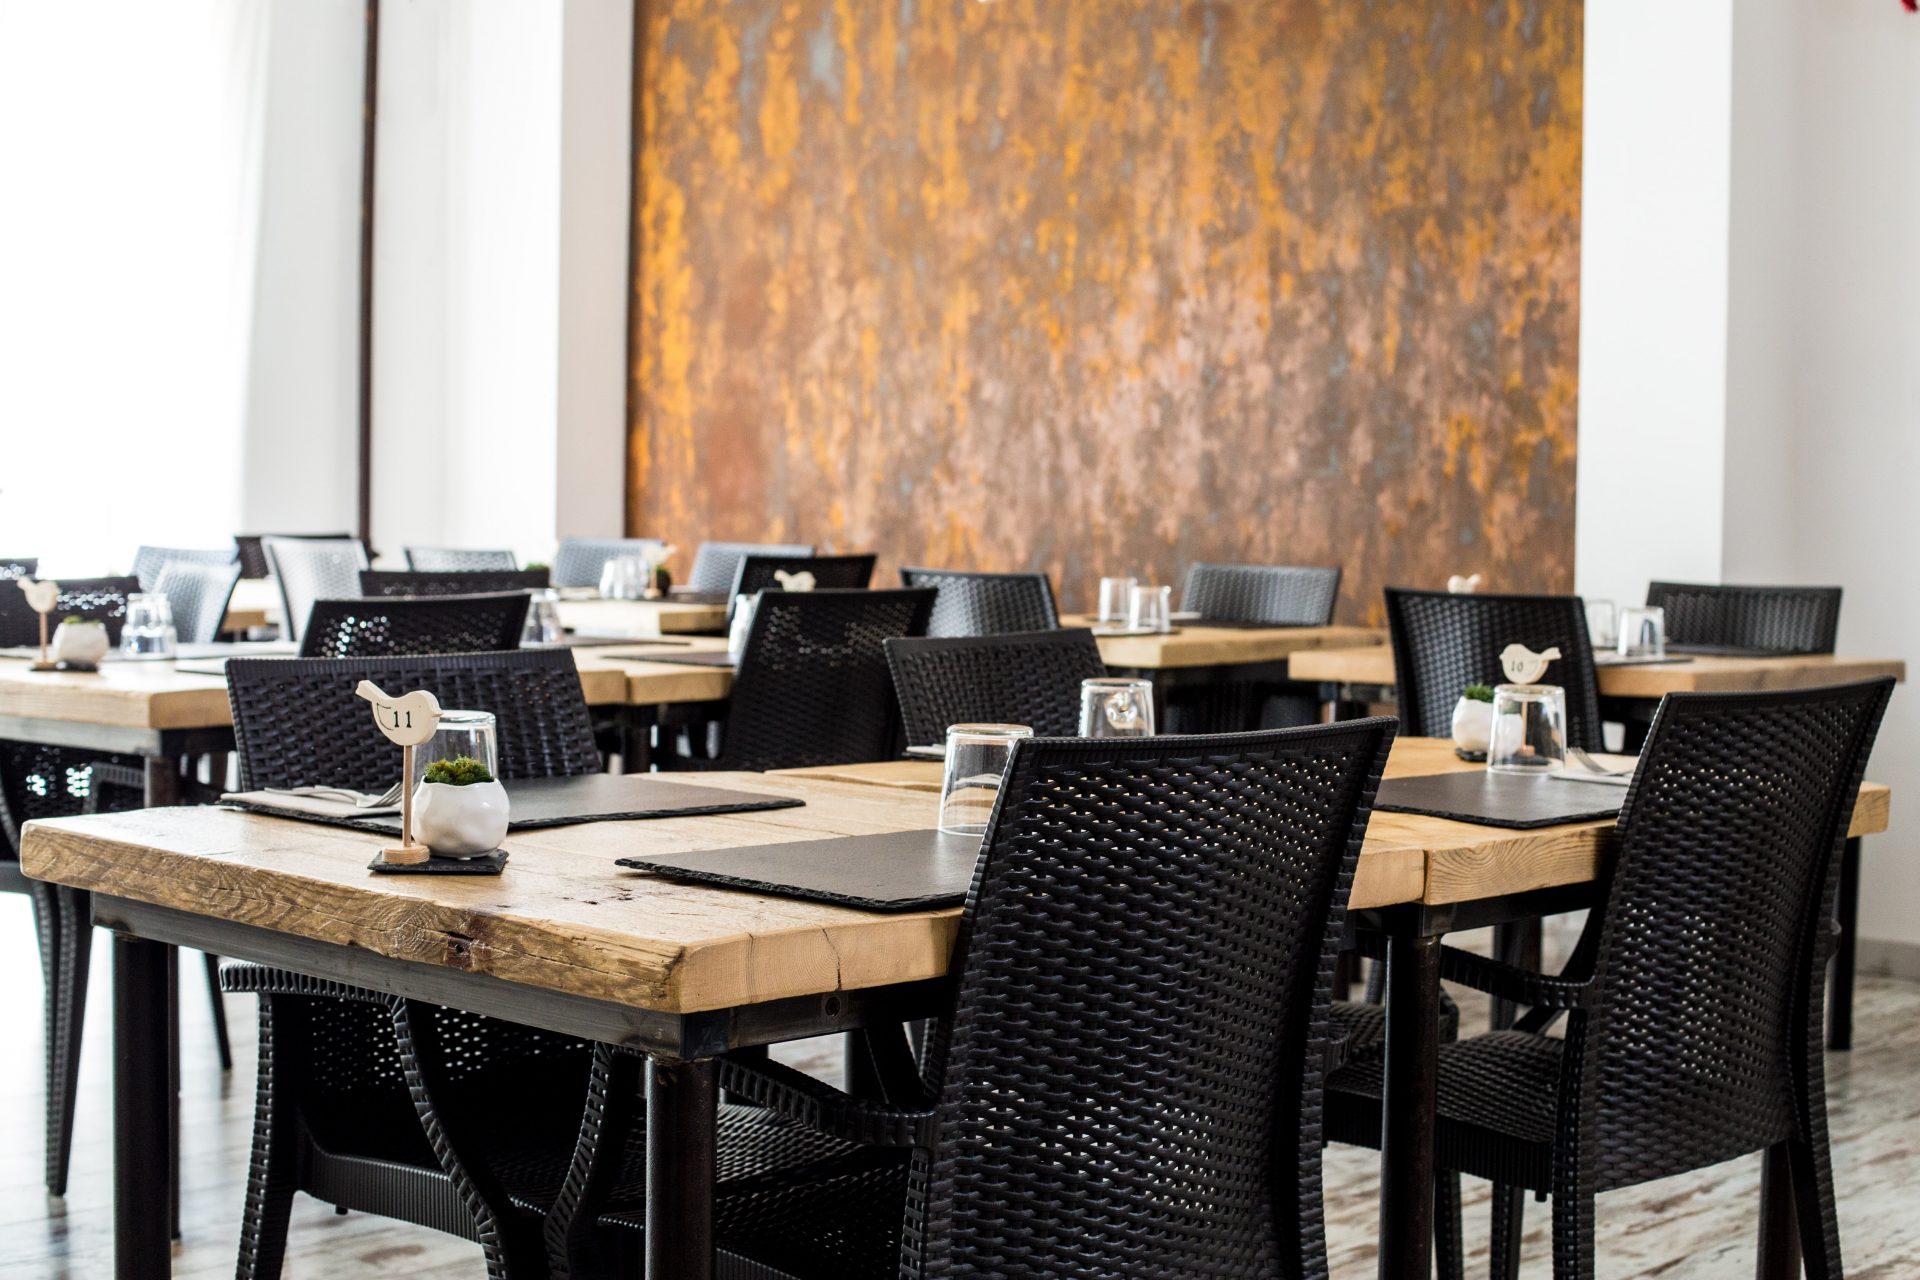 vero-restaurant-sala-pranzo